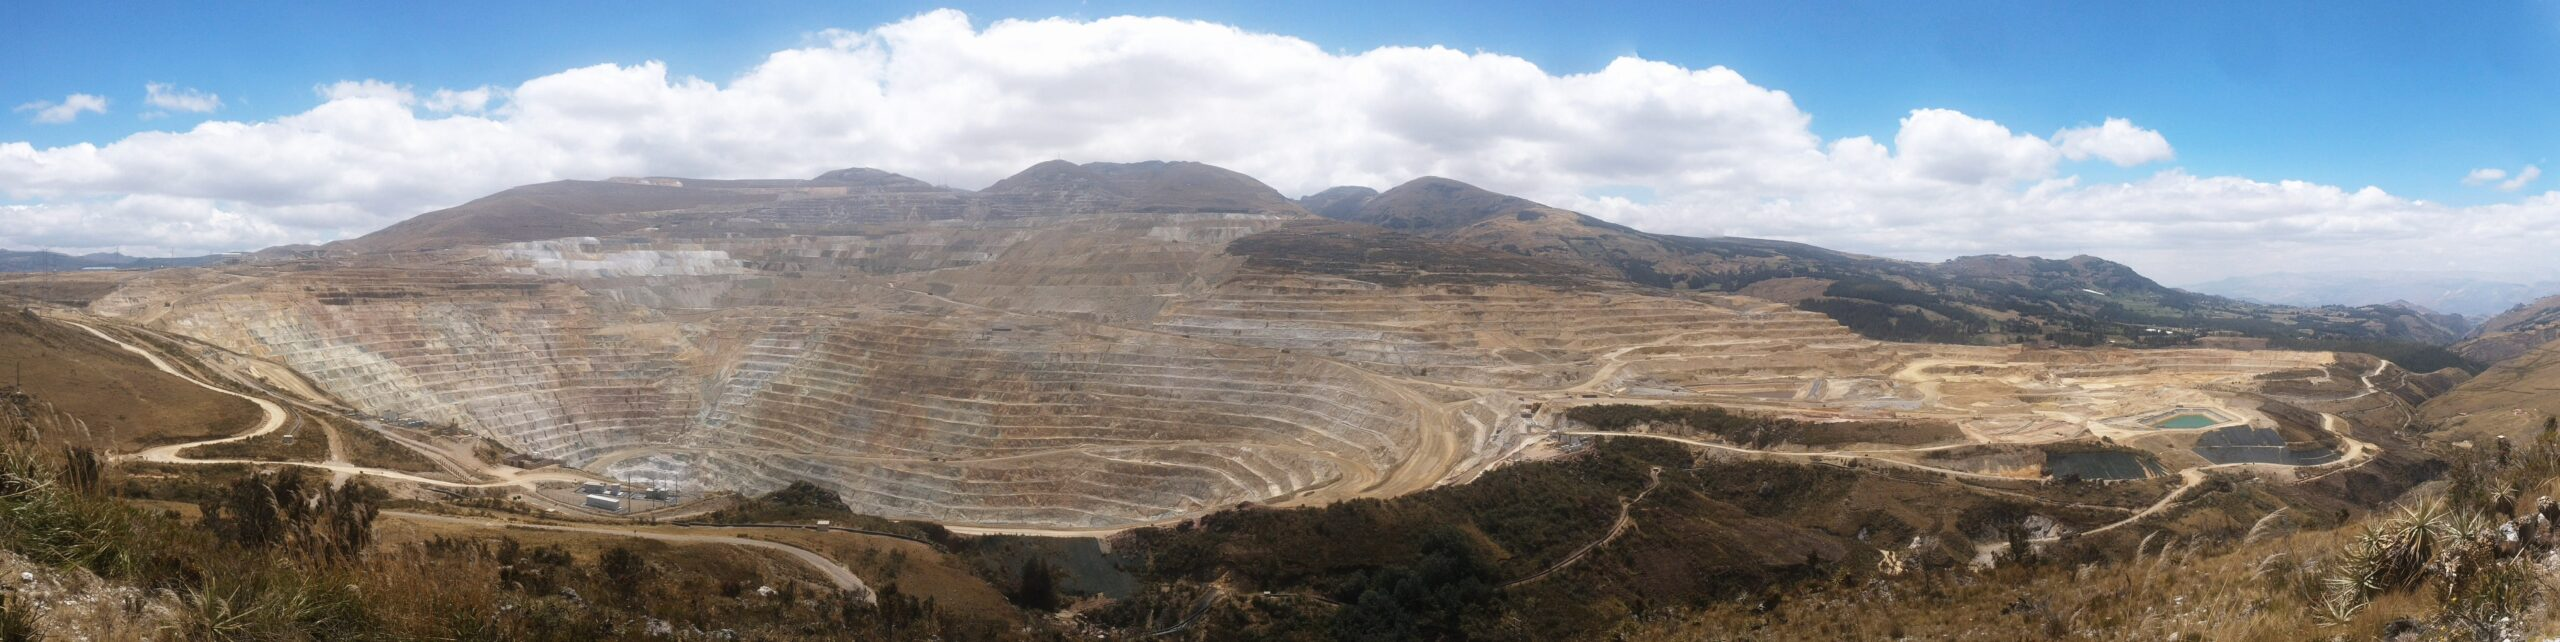 Yanacocha mine, Cajamarca, Peru